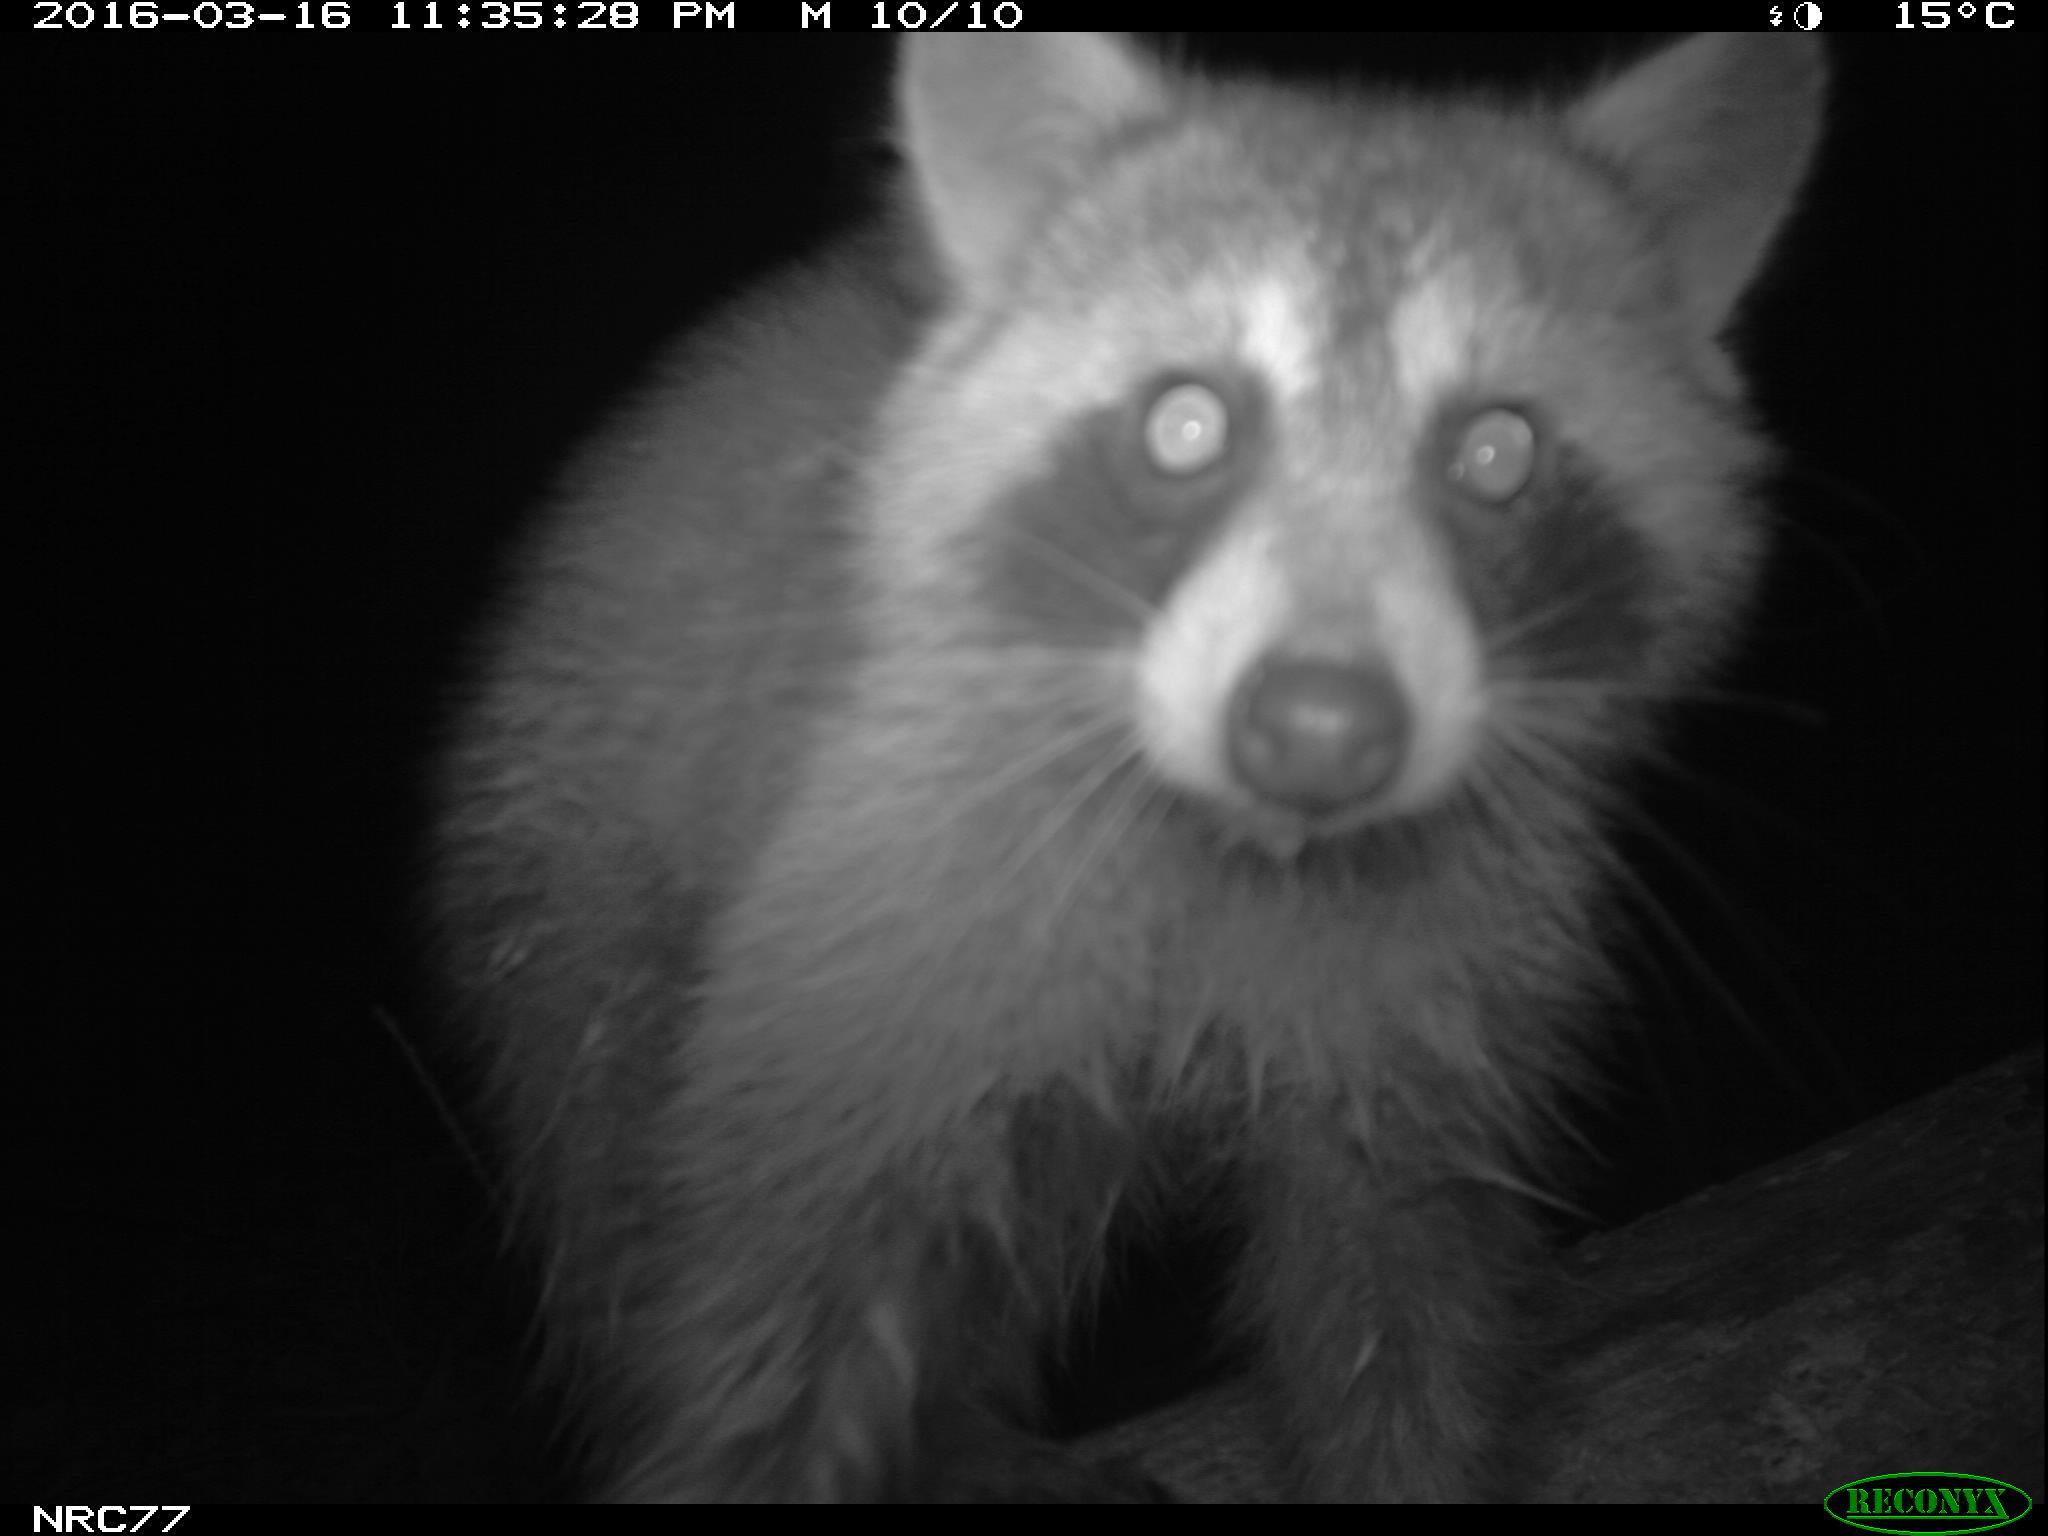 raccoon on camera trap